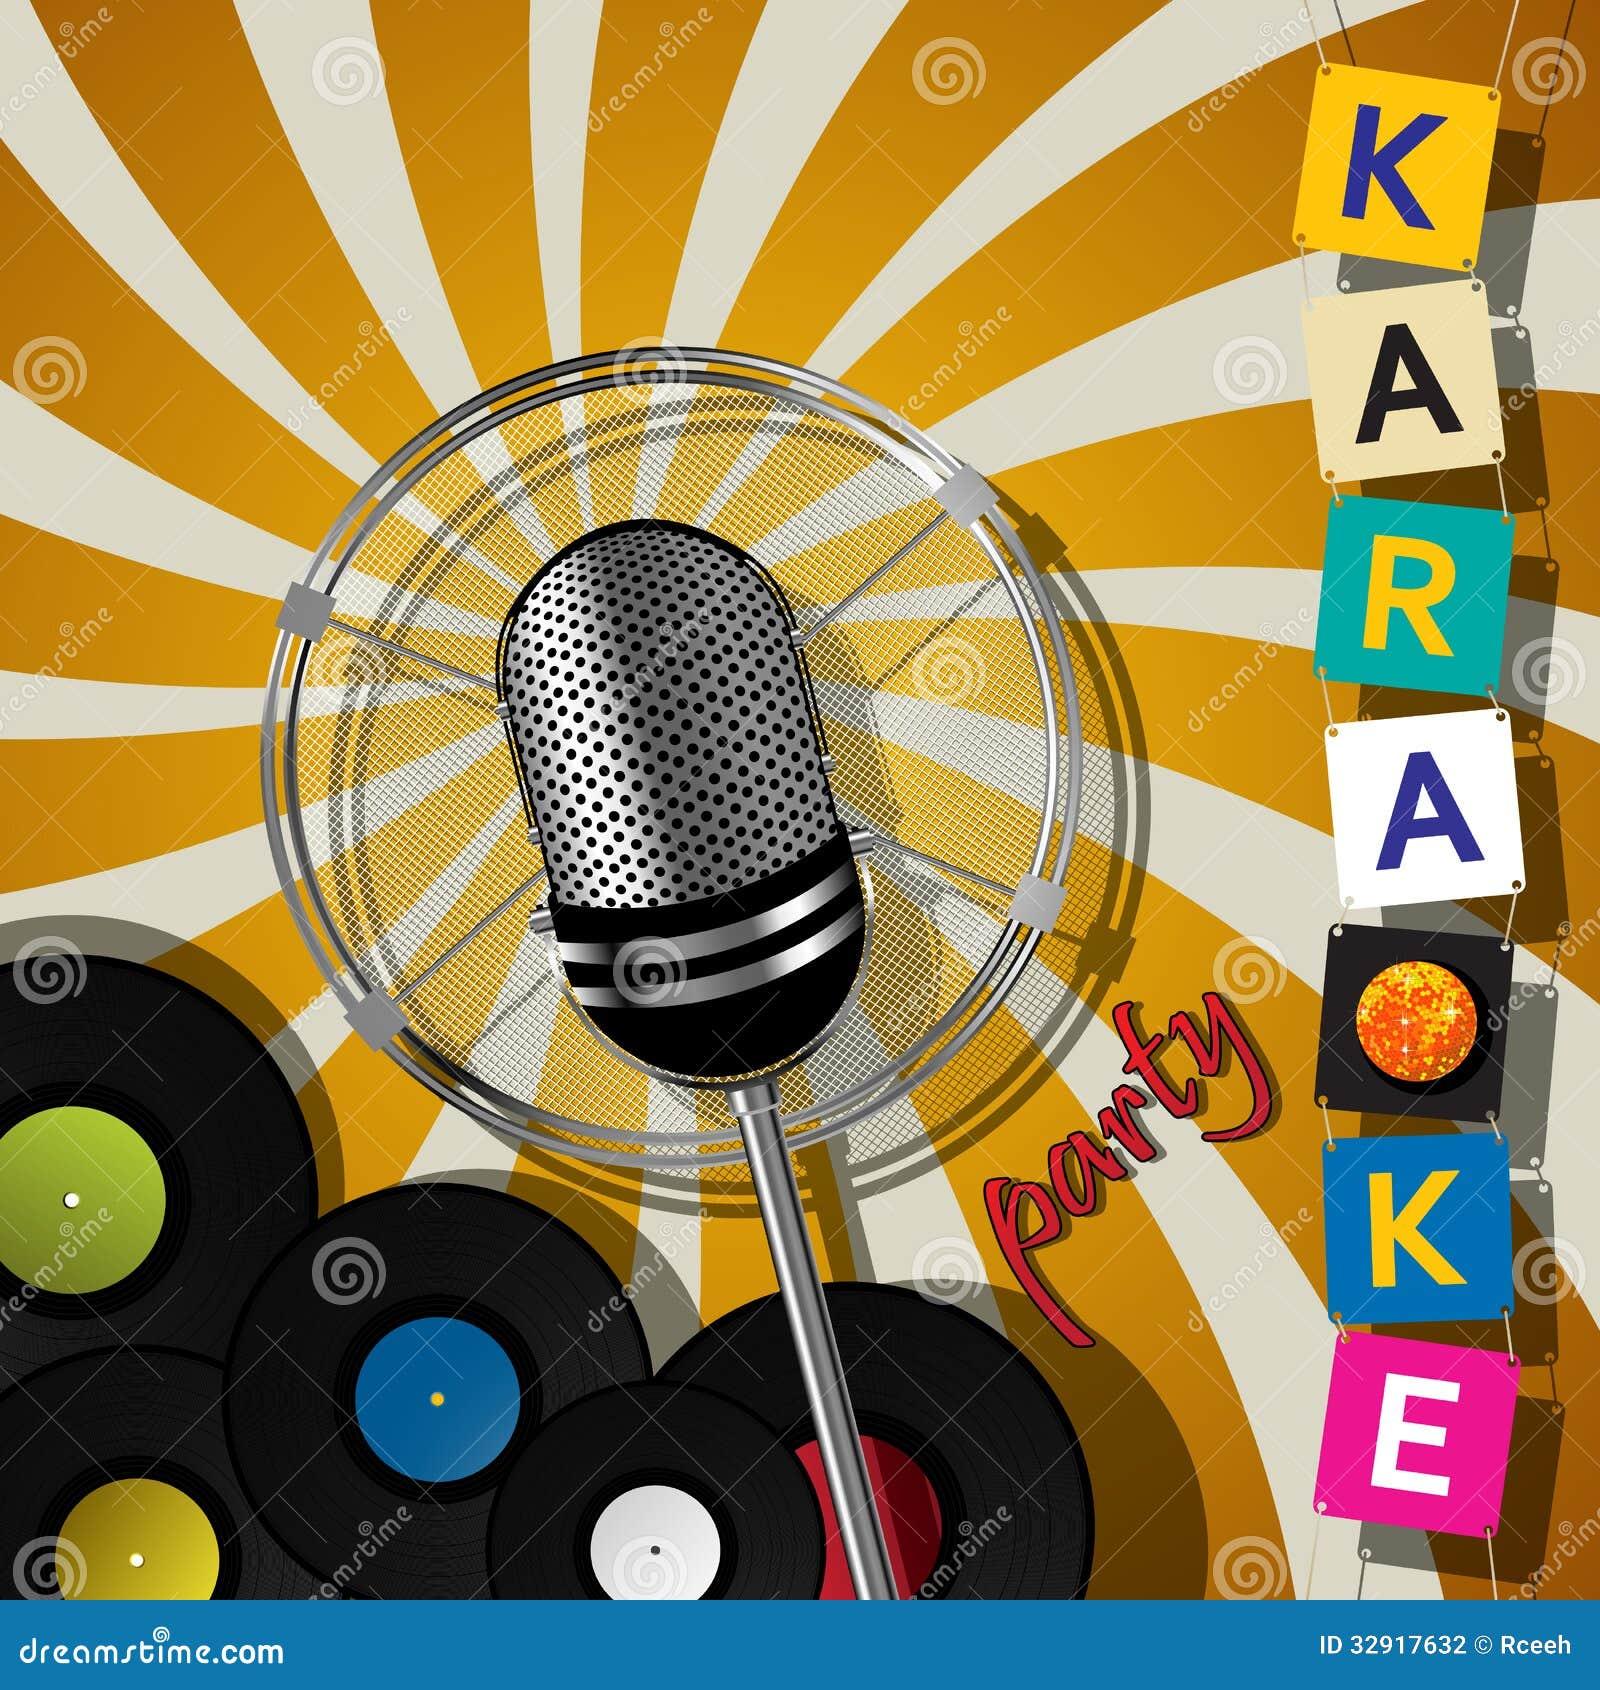 Karaoke Party Free